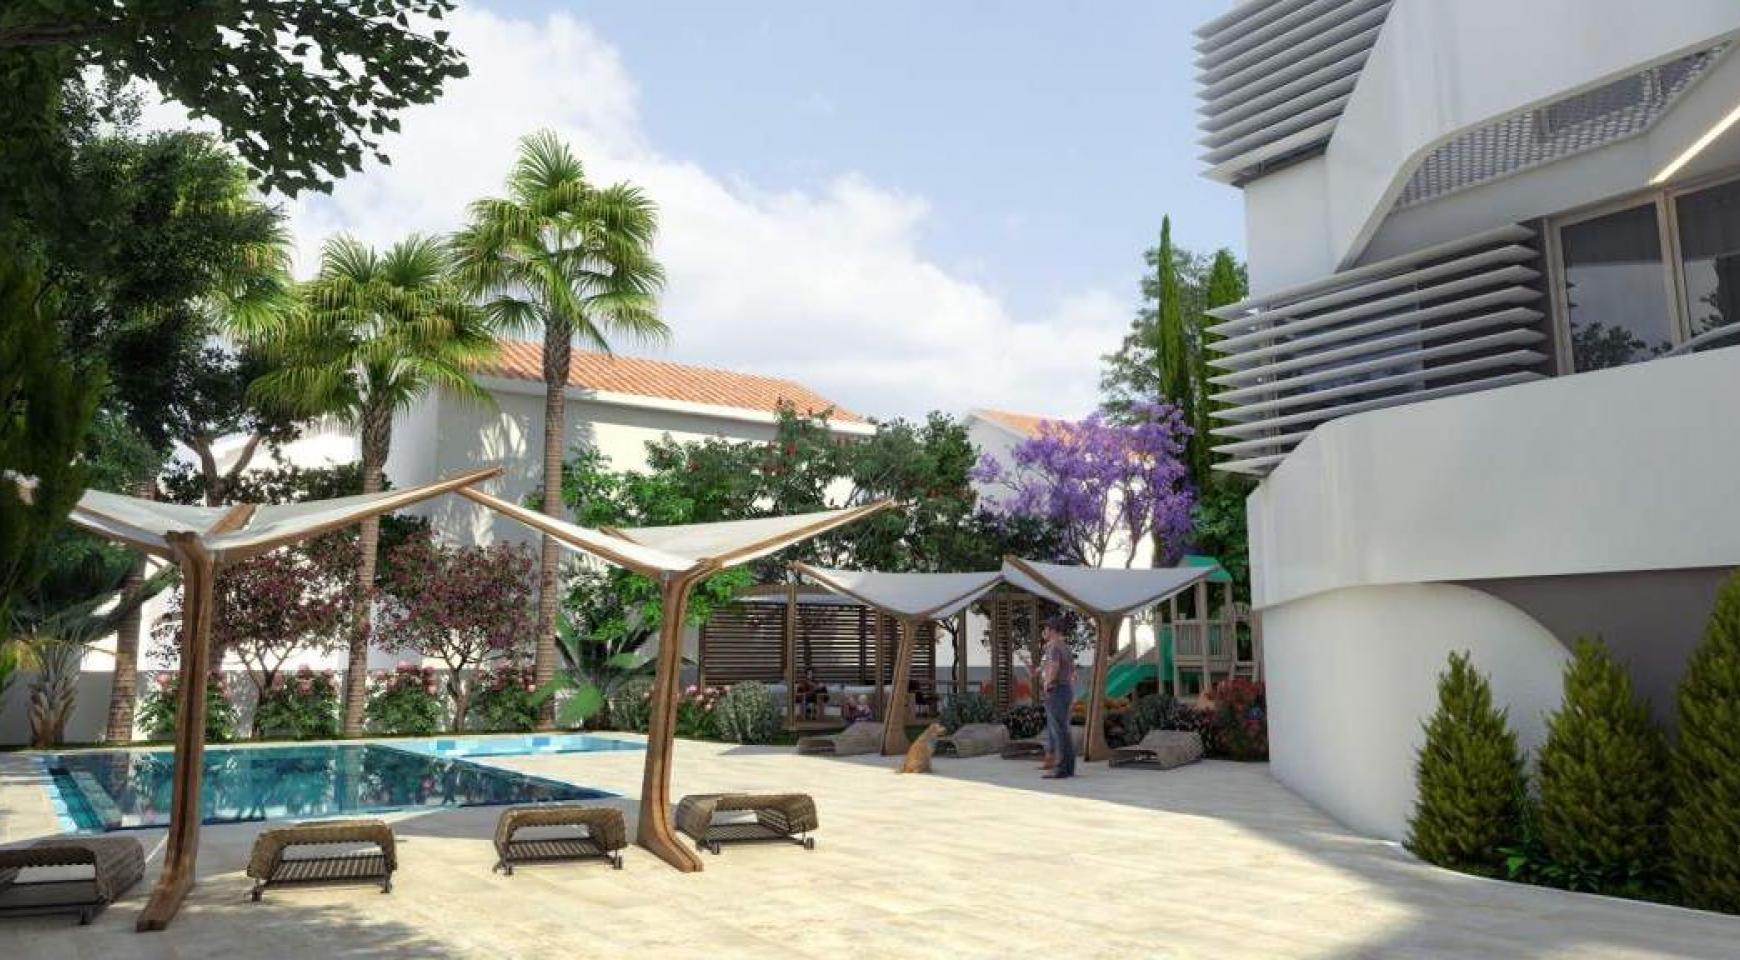 New 3 Bedroom Apartment in a Contemporary Complex near the Sea - 14